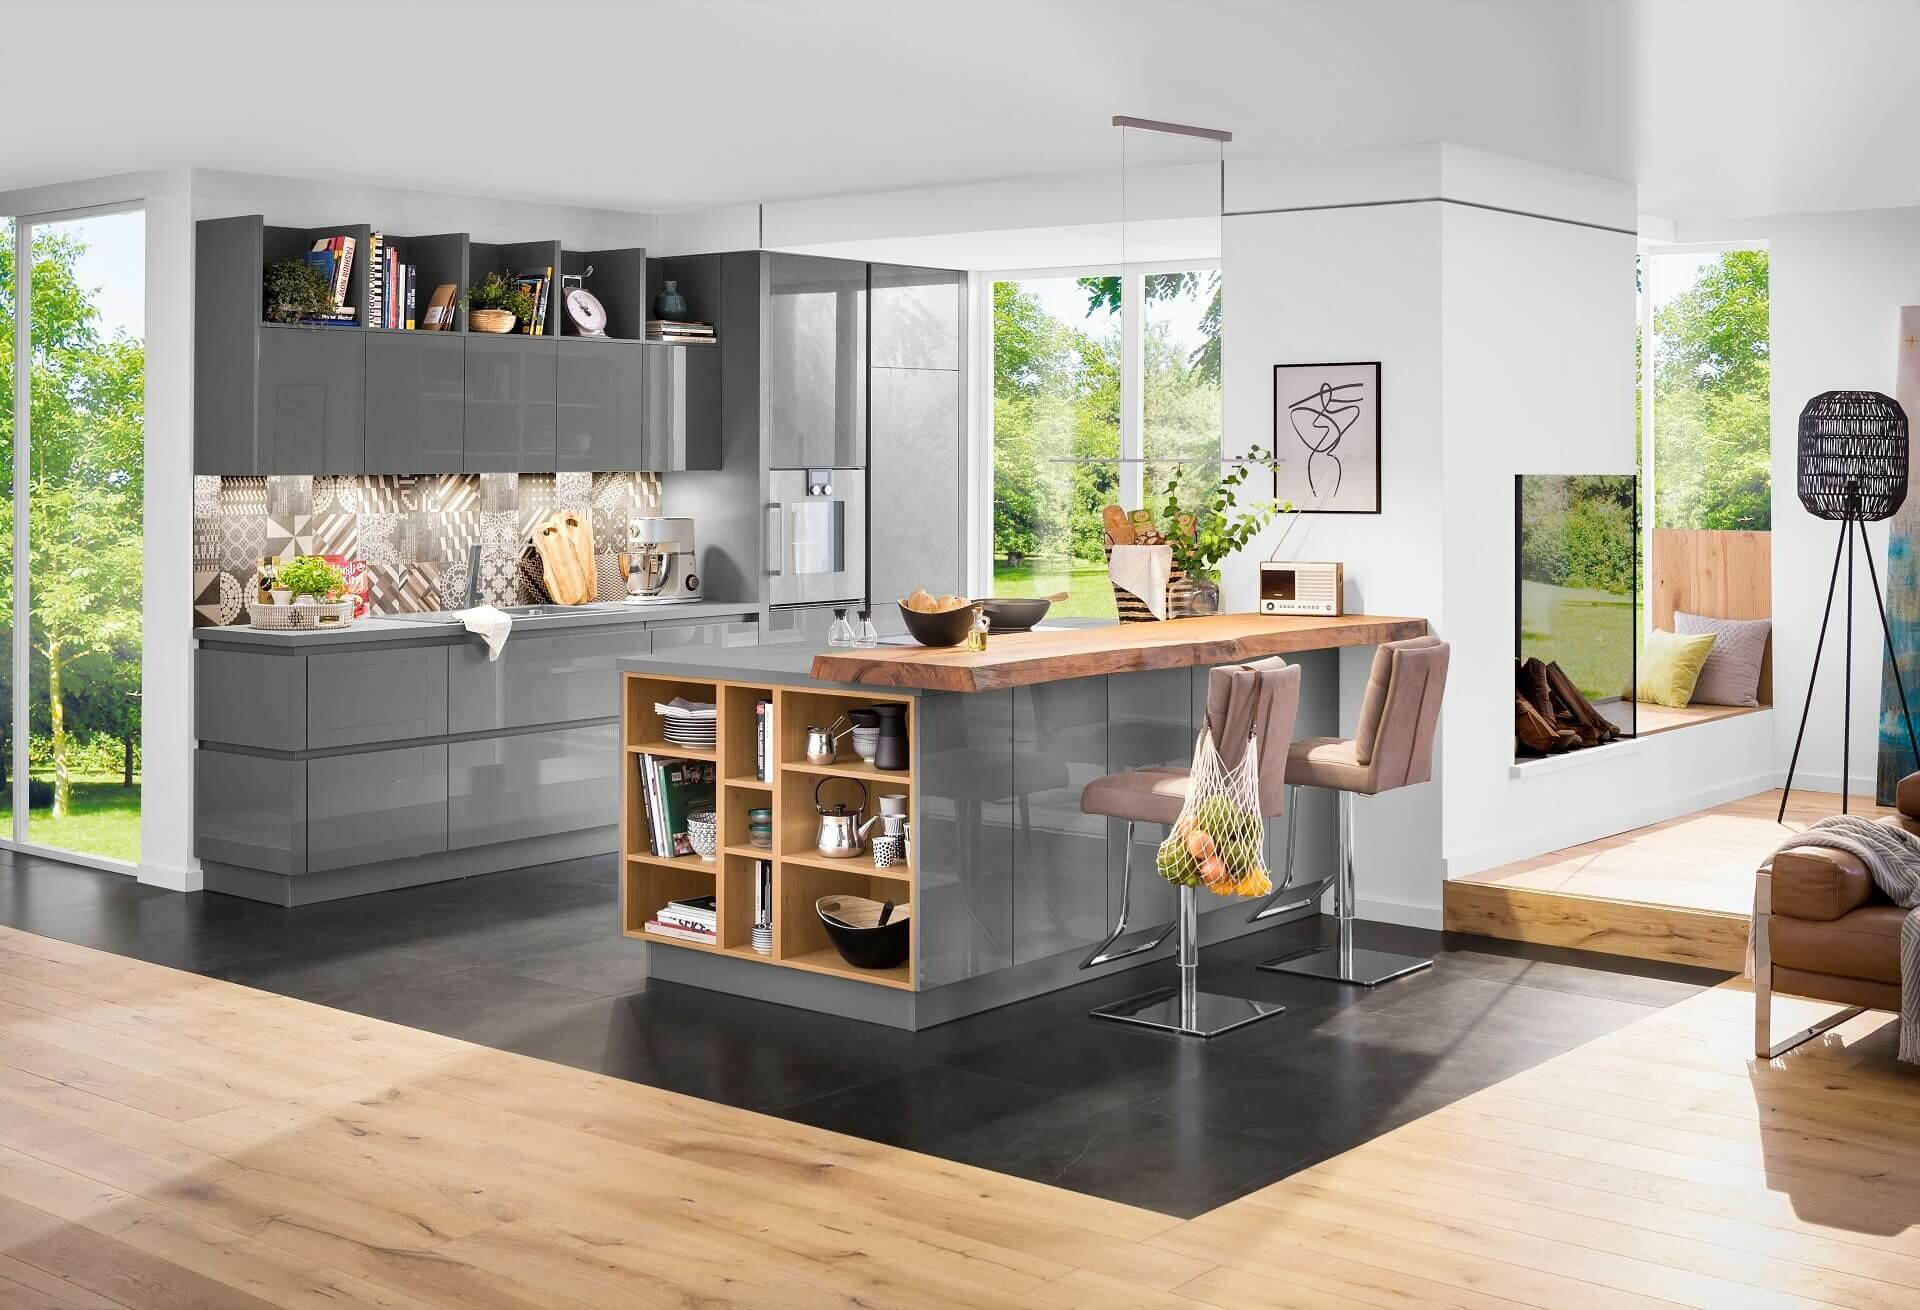 Full Size of Kche Kaufen Bei Segmller Segmuellerde Segmüller Küche Küchen Regal Wohnzimmer Segmüller Küchen